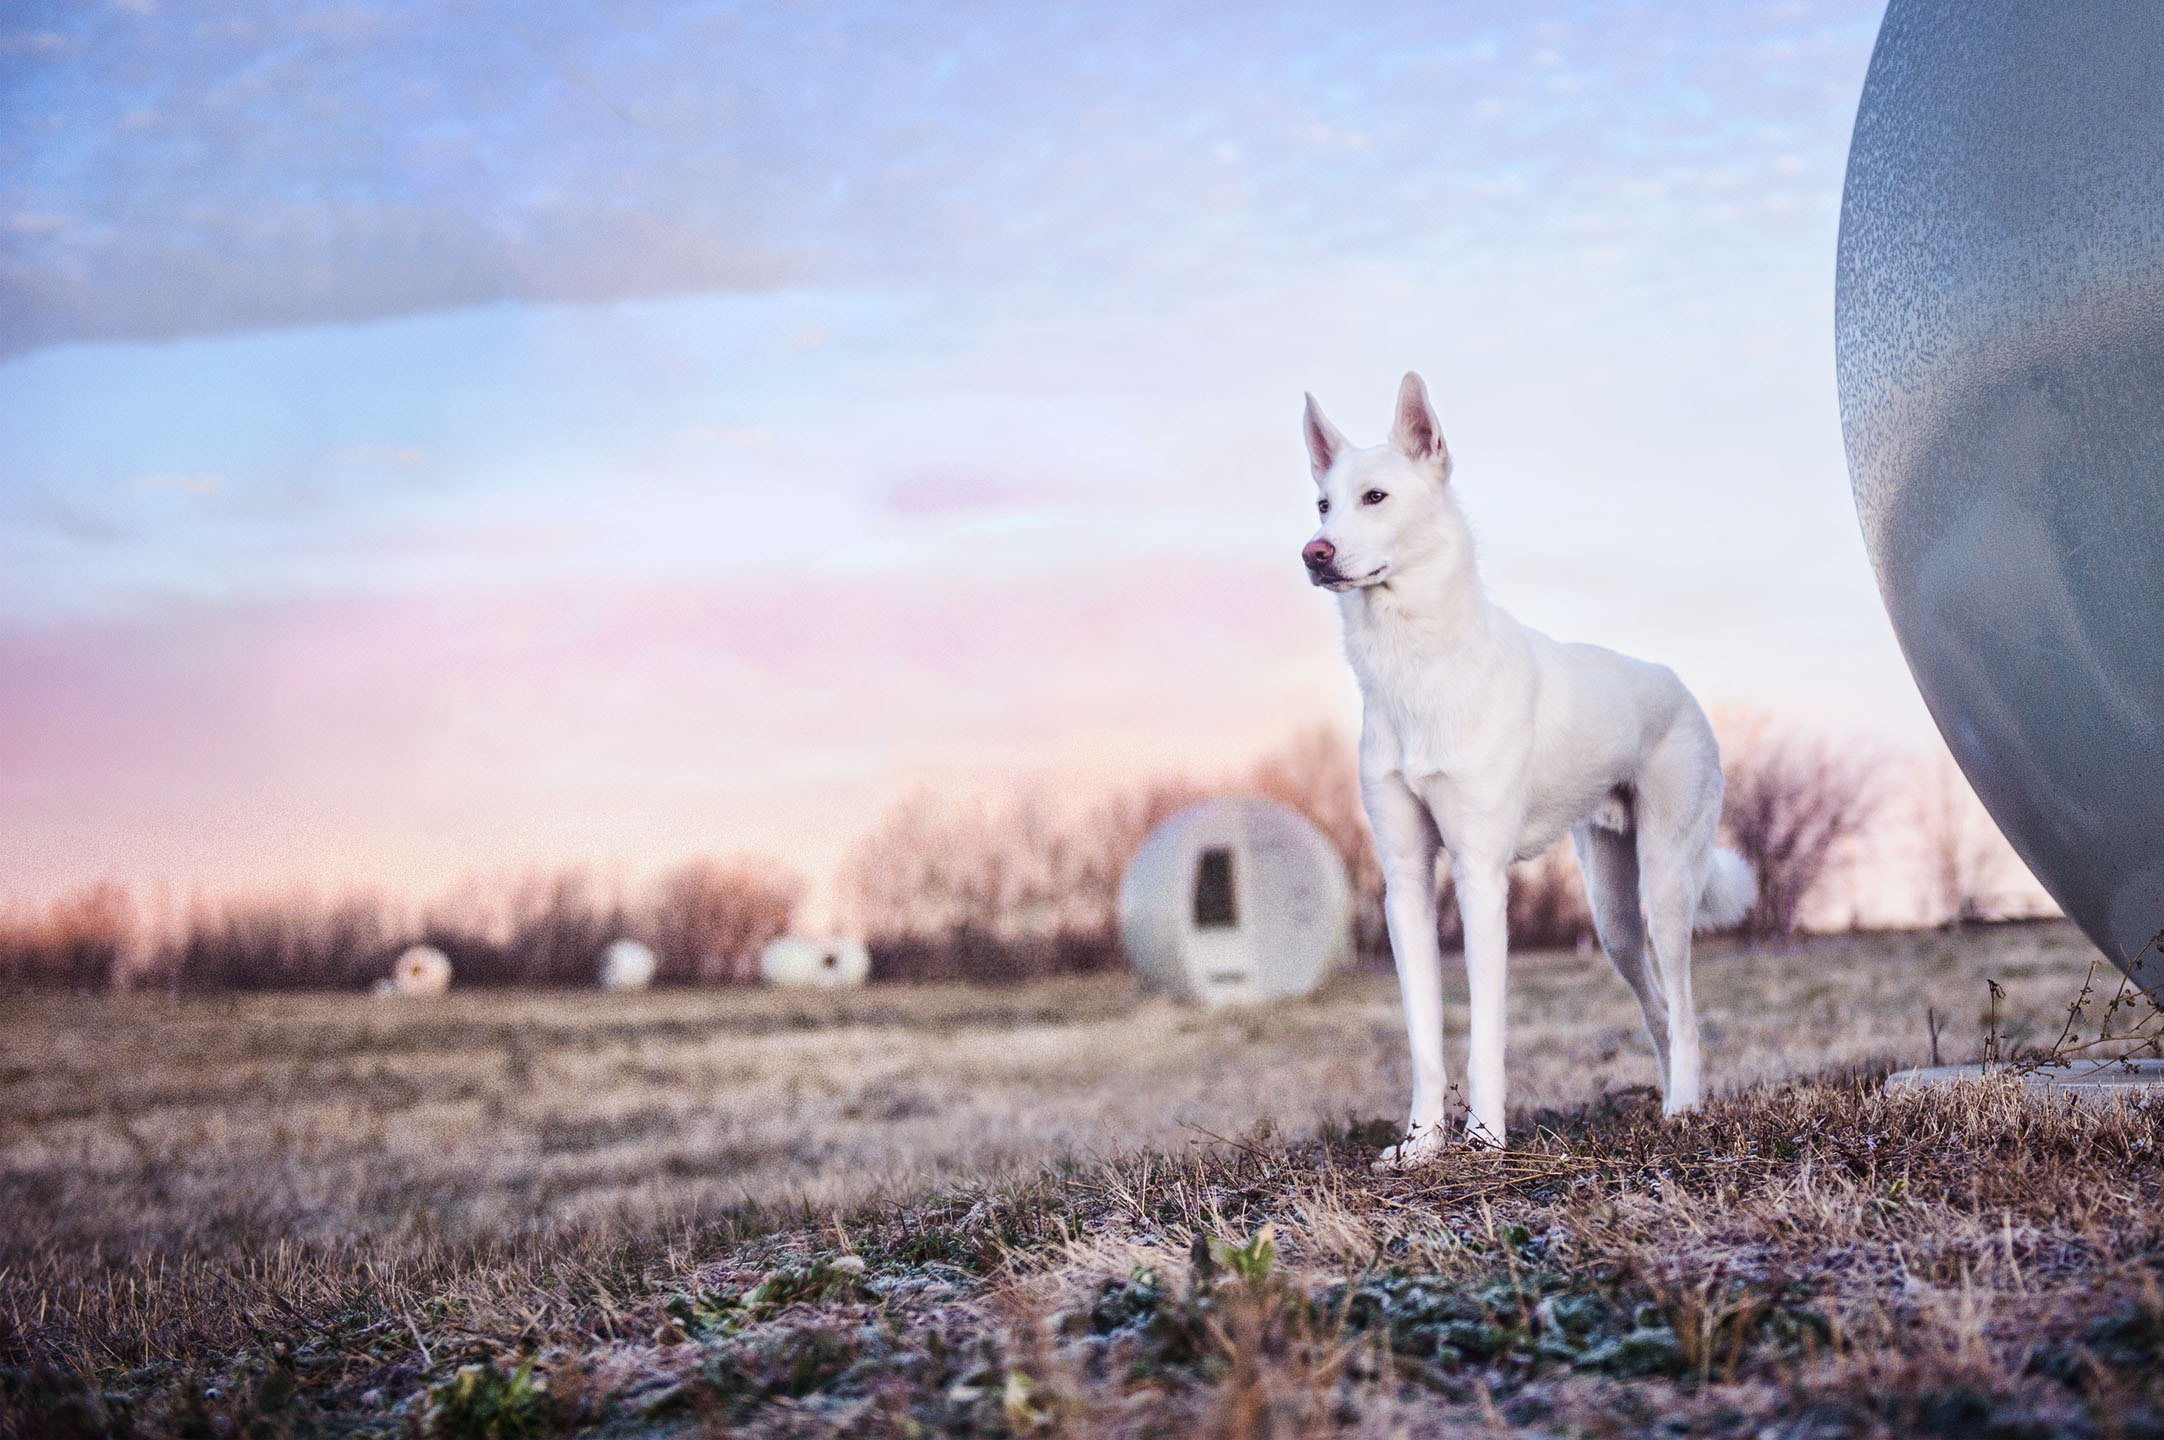 sci-fi-dog-photography-montreal-4014.jpg